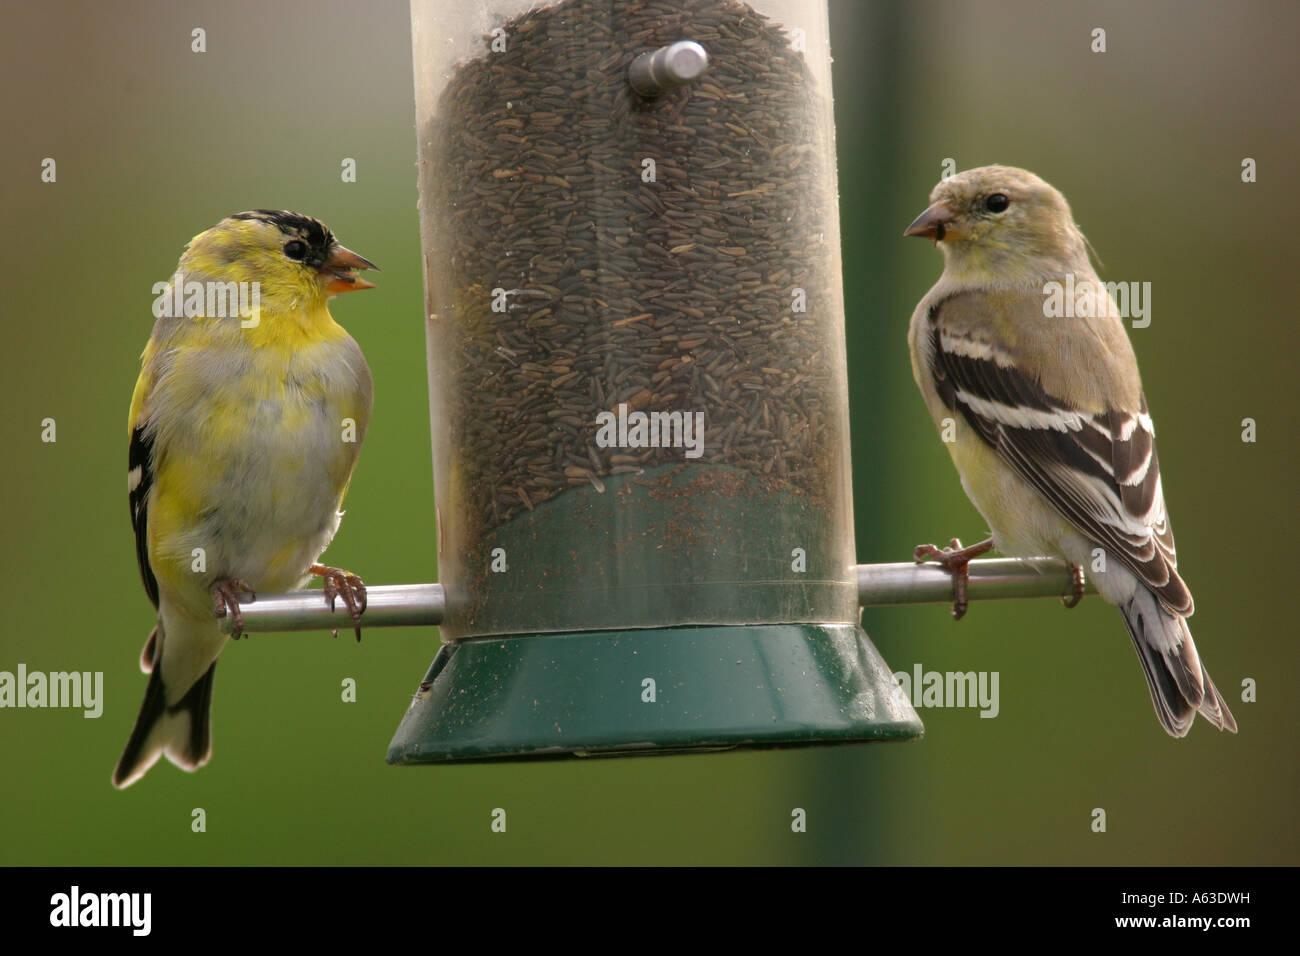 brandt photo feeders flickr thistle feeder york choosing tom audubon cc conservation new nyjer bird a